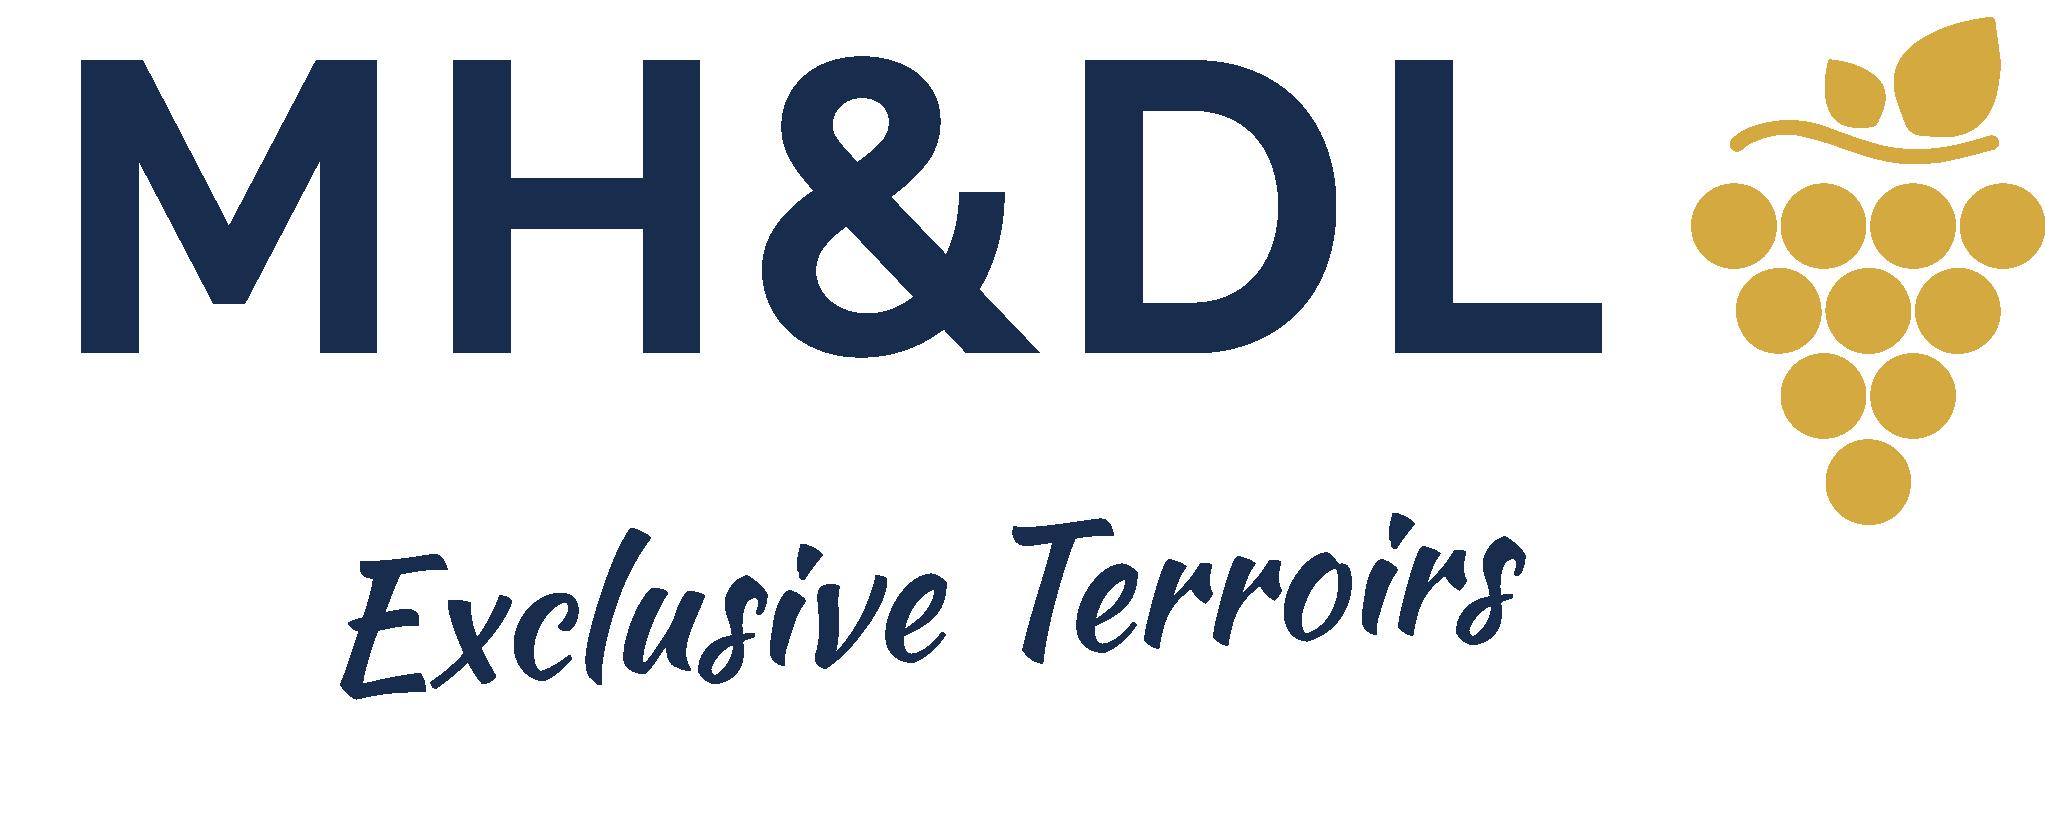 https://marjadesign.nl/wp-content/uploads/2020/06/Logo-web-4.png